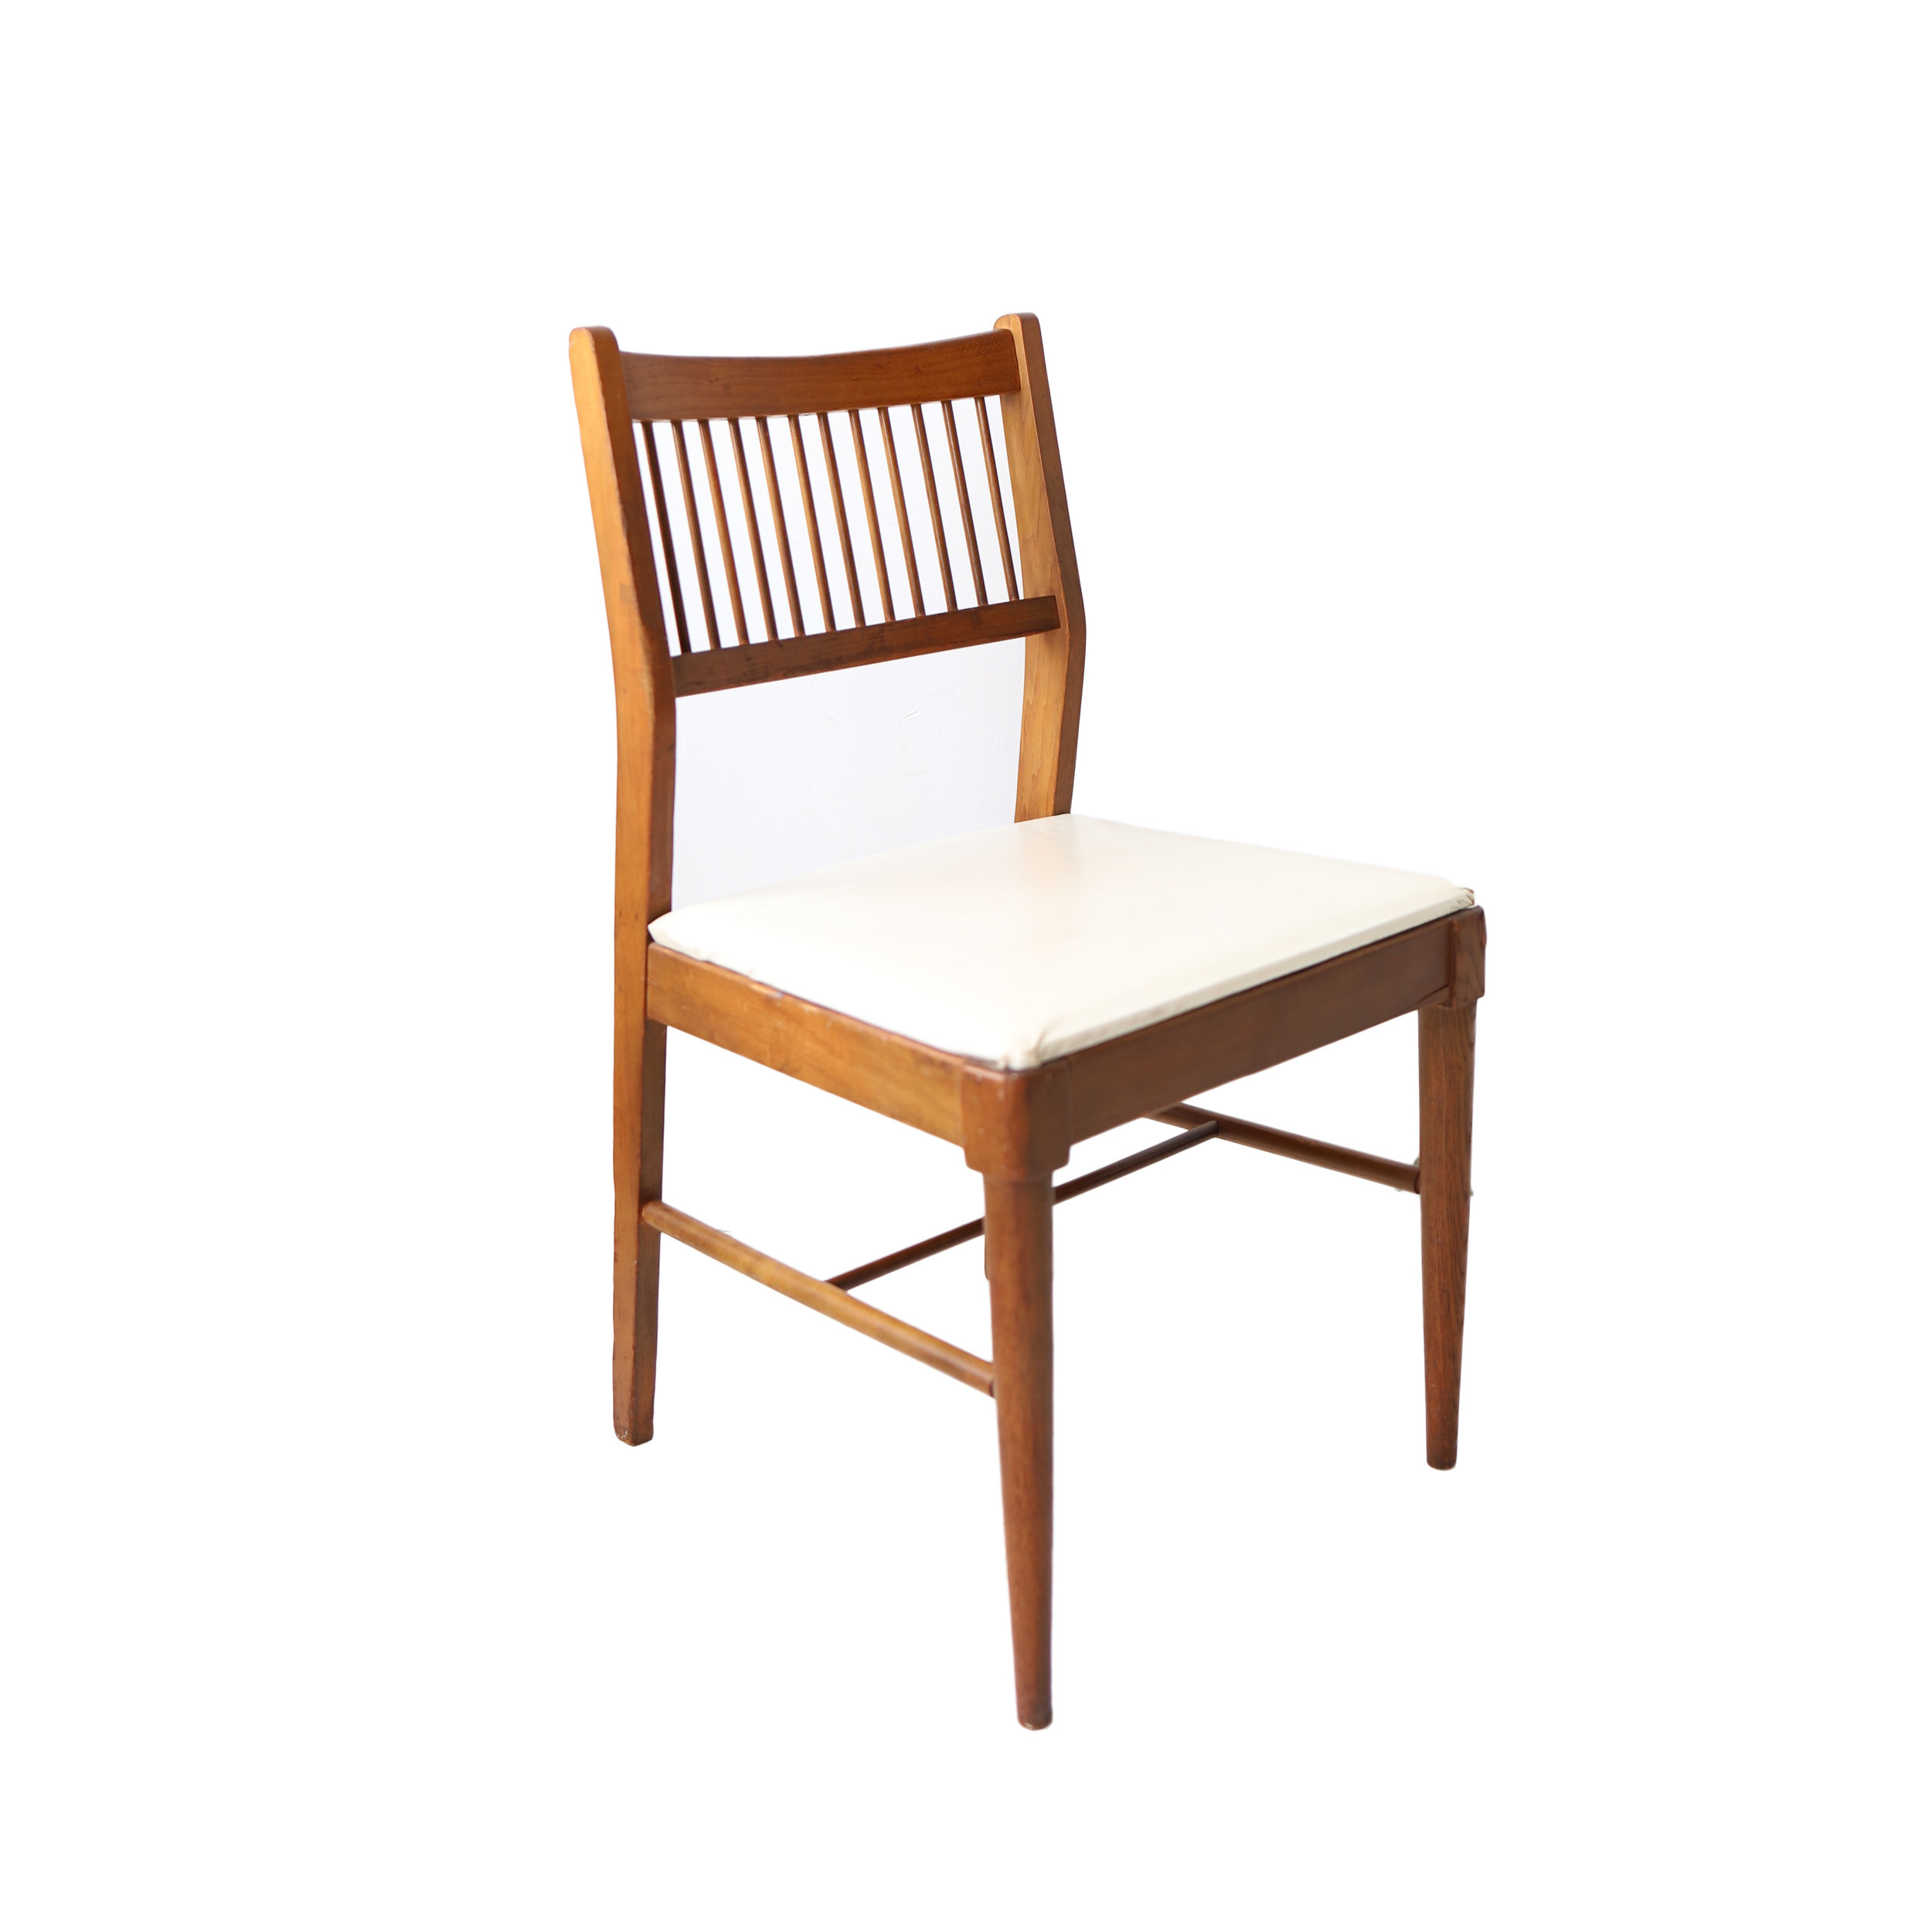 mid century modern desk chair.jpg